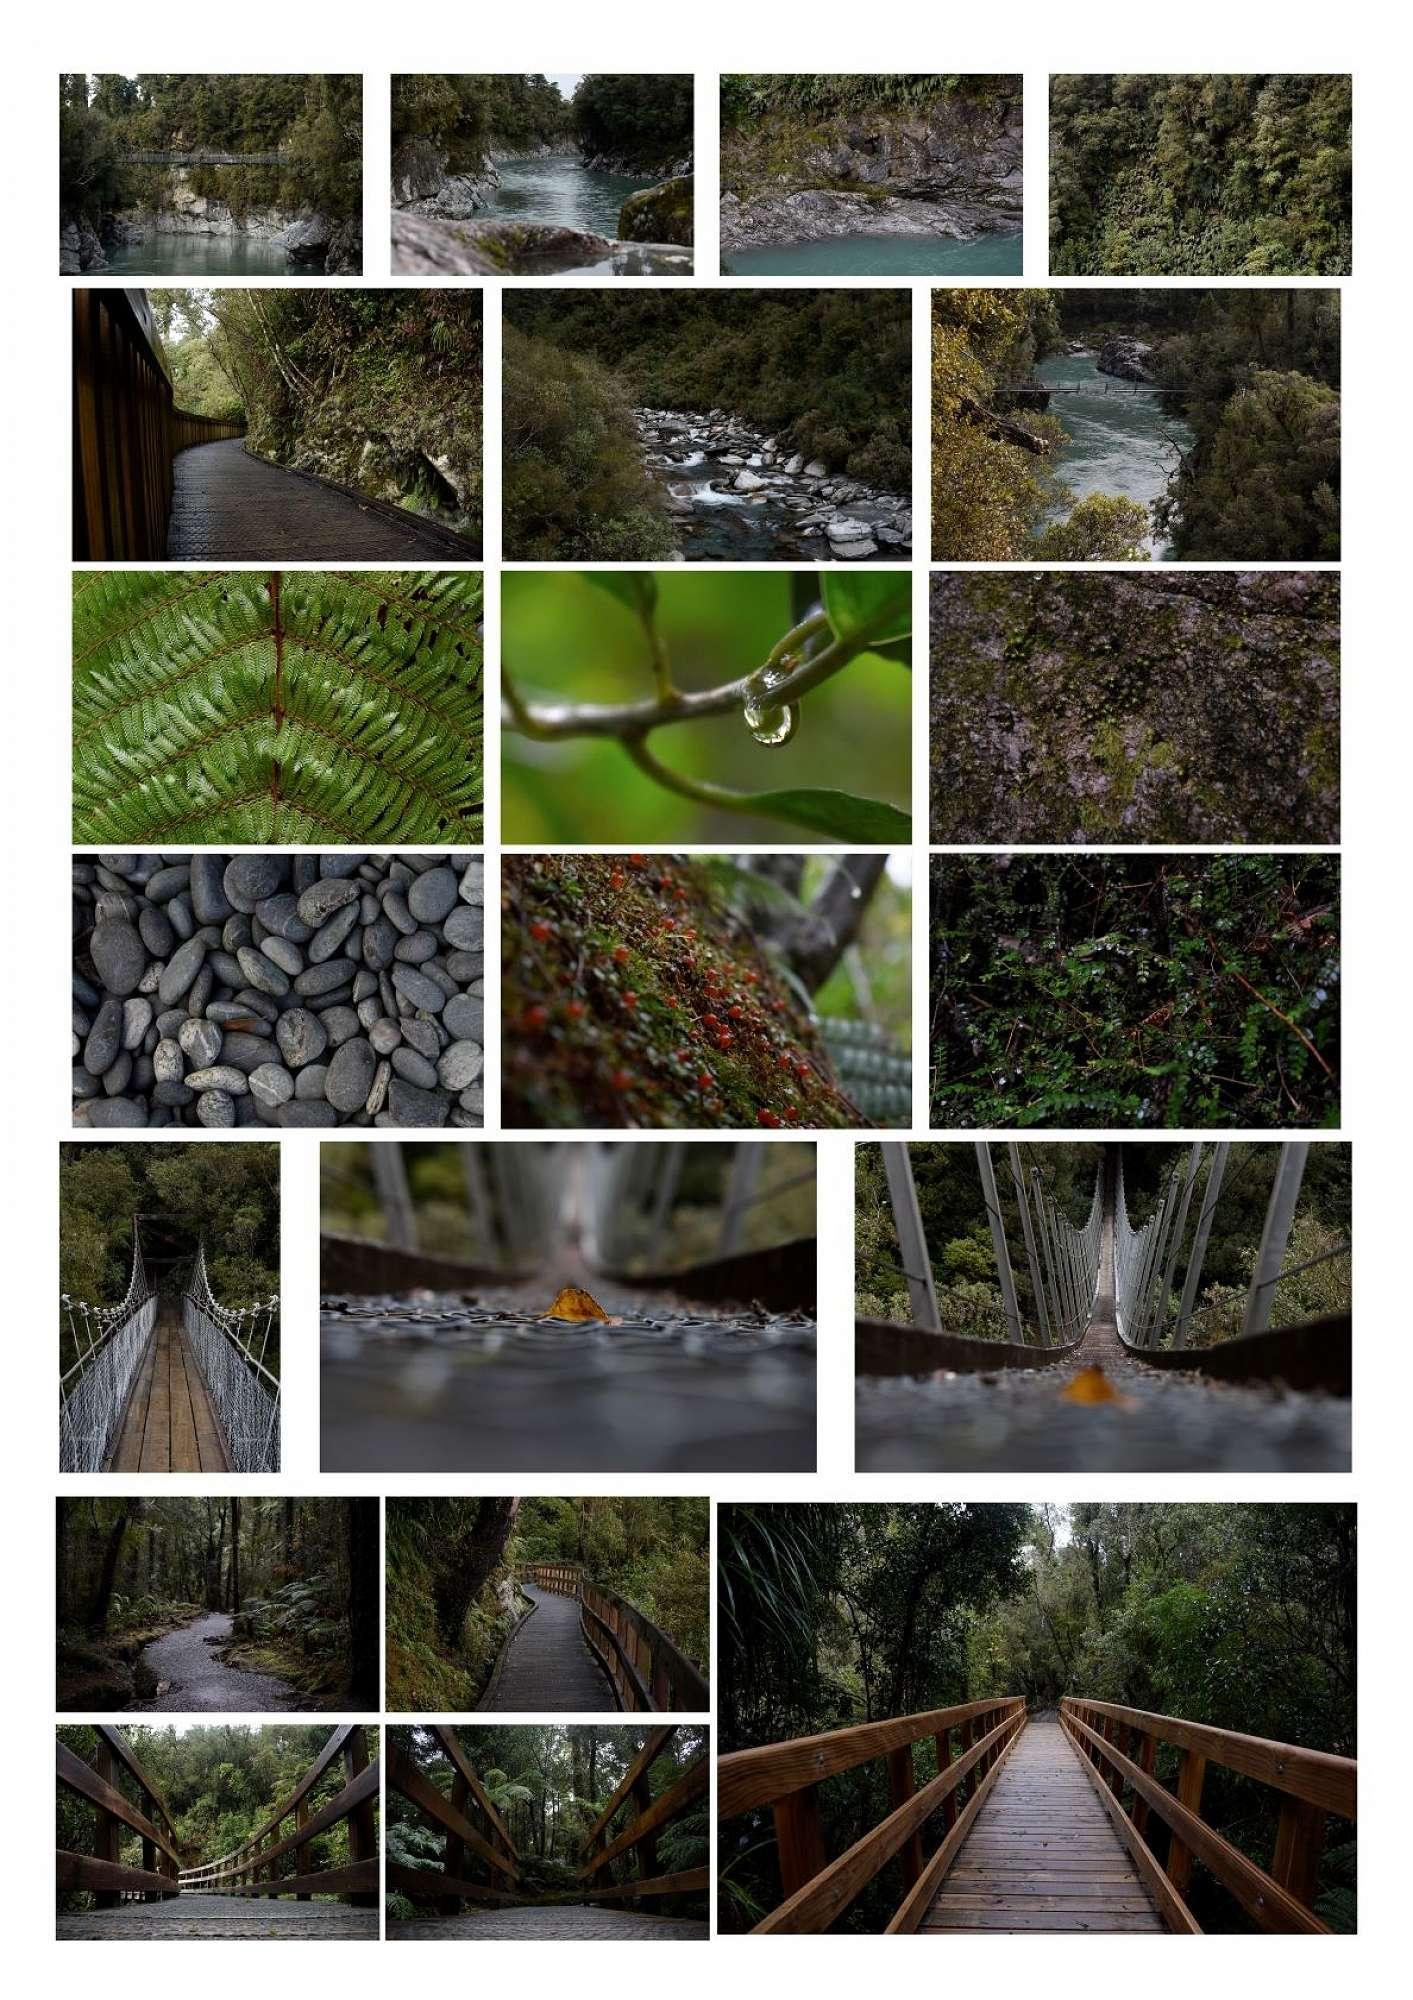 Joshua Nolan - NCEA Level 2 Photography portfolio (Left side)